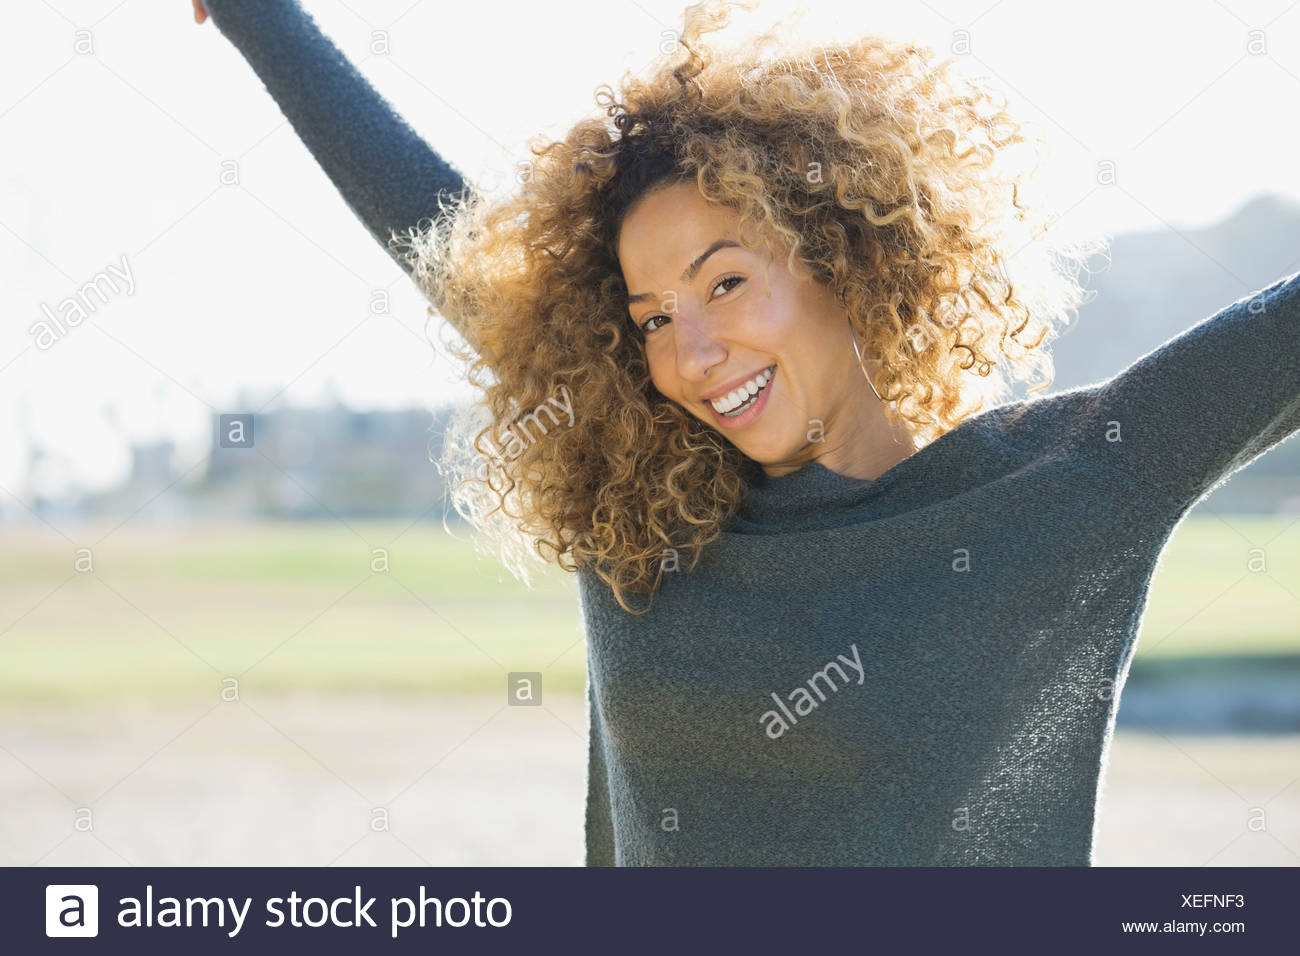 Porträt Frau mit im freien erhobenen Armen Stockbild